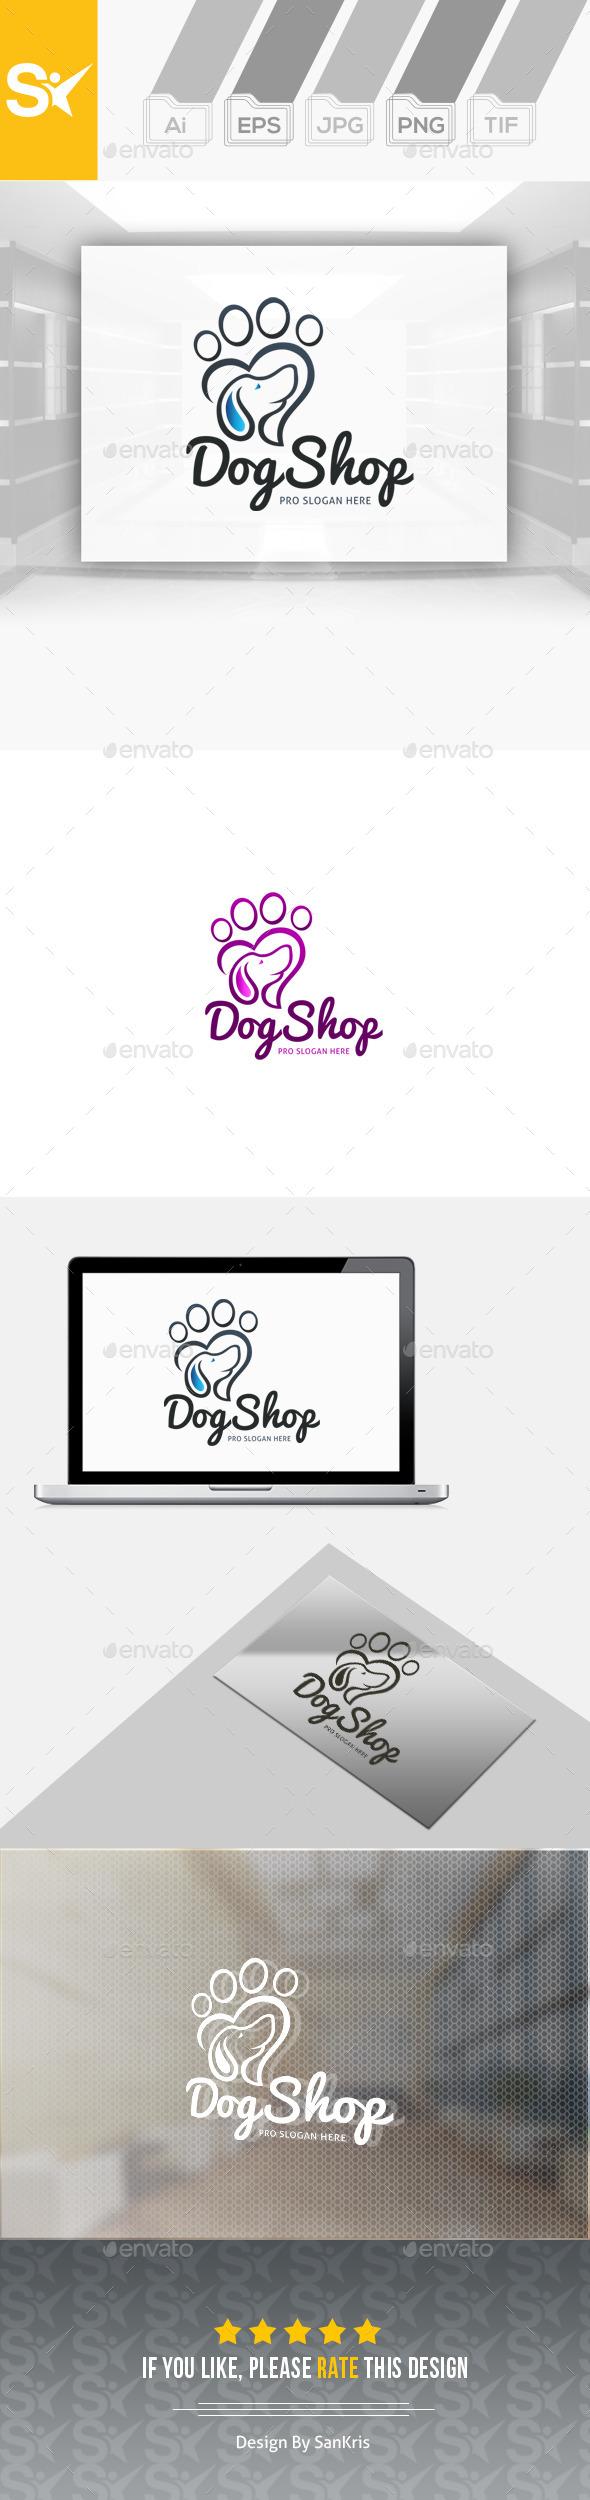 Dog Shop Logo - Animals Logo Templates